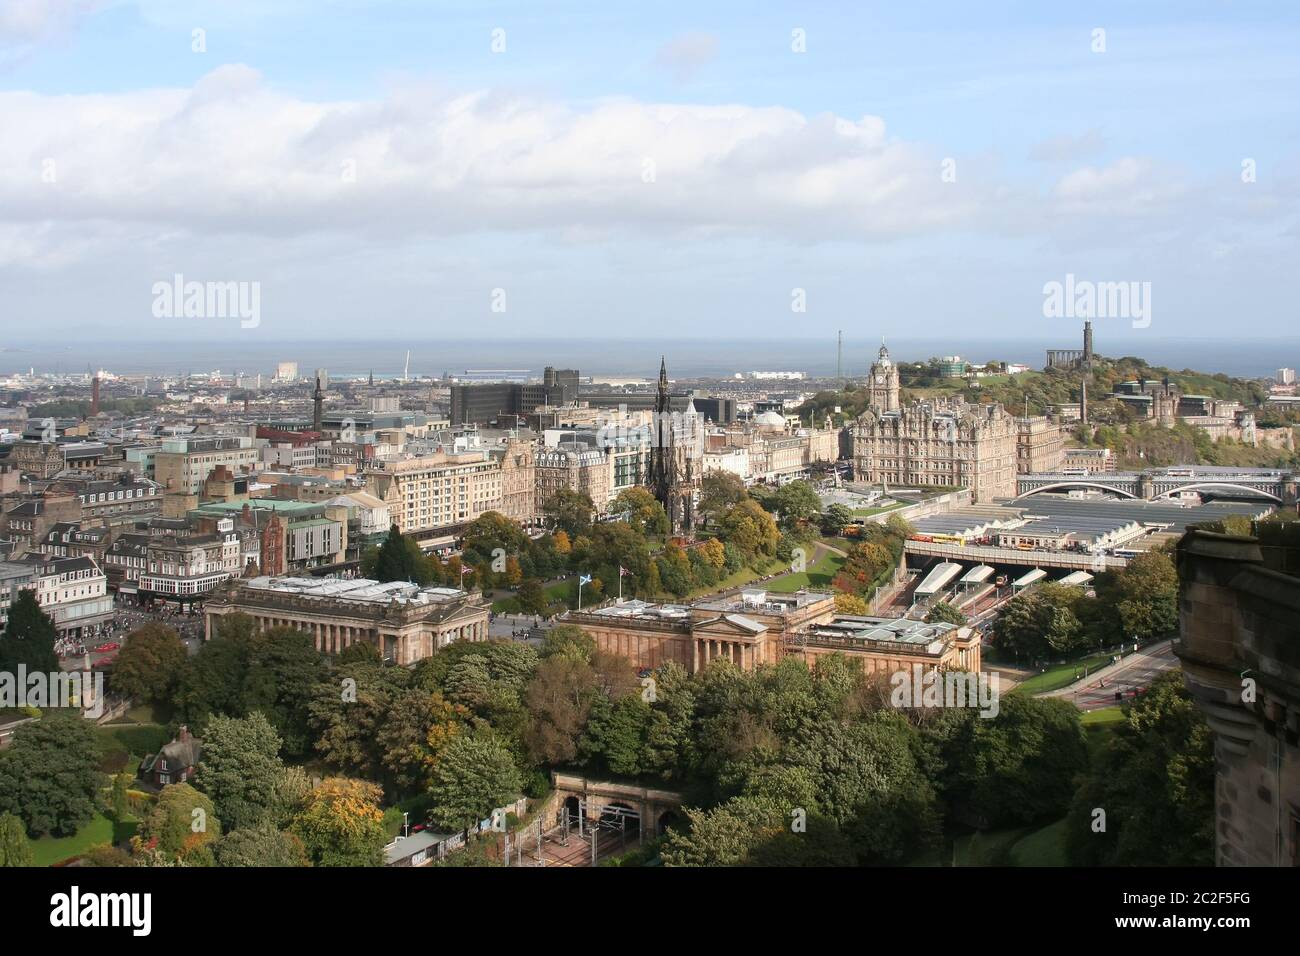 Edinburgh capital city of Scotland Great Britain UK Stock Photo